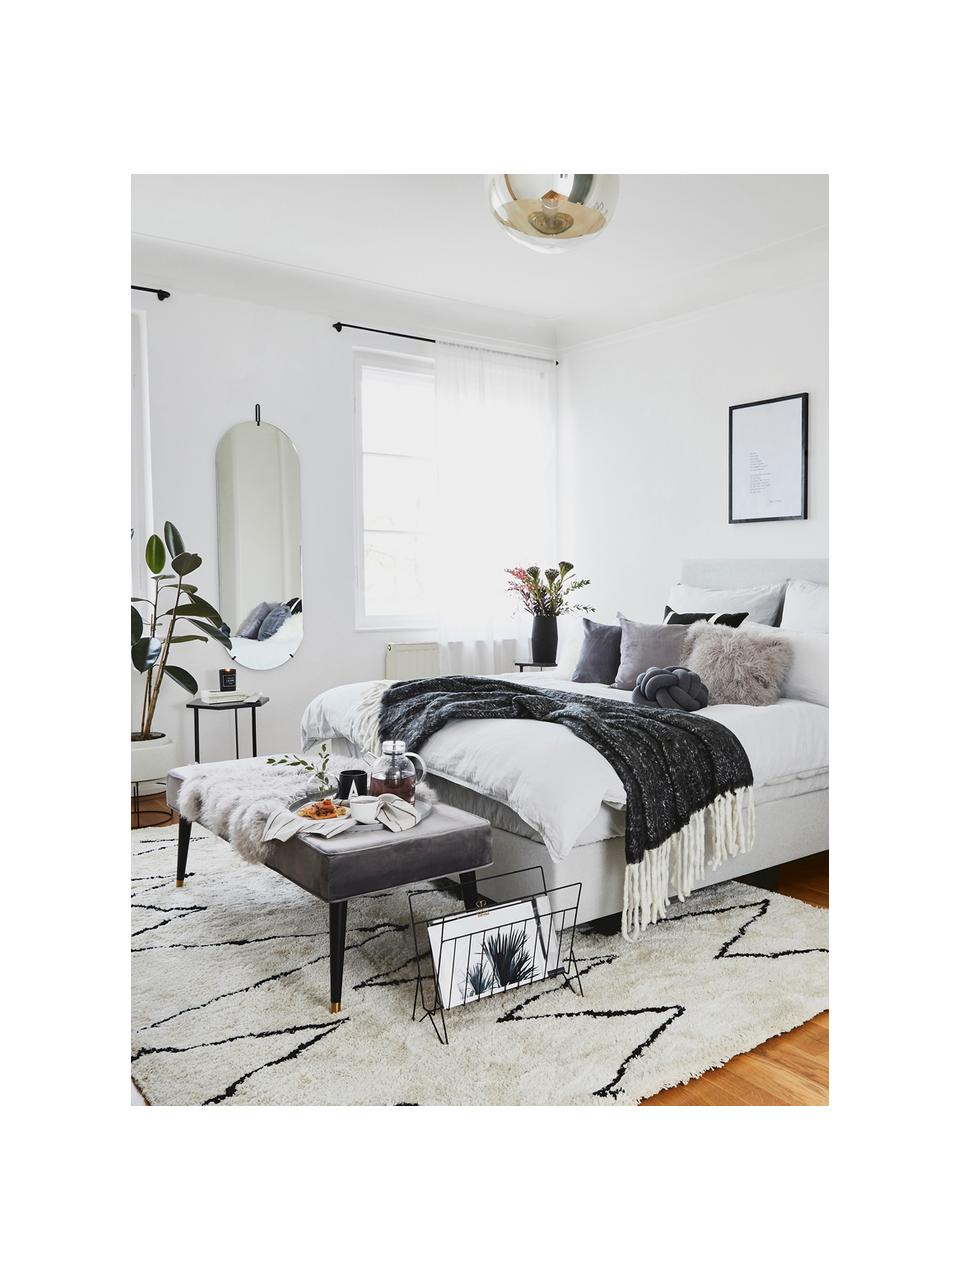 Samt-Sitzbank Beverly, Bezug: Samt (Polyester) 50.000 S, Gestell: Eukalyptusholz, Beine: Metall, pulverbeschichtet, Grau, 140 x 46 cm